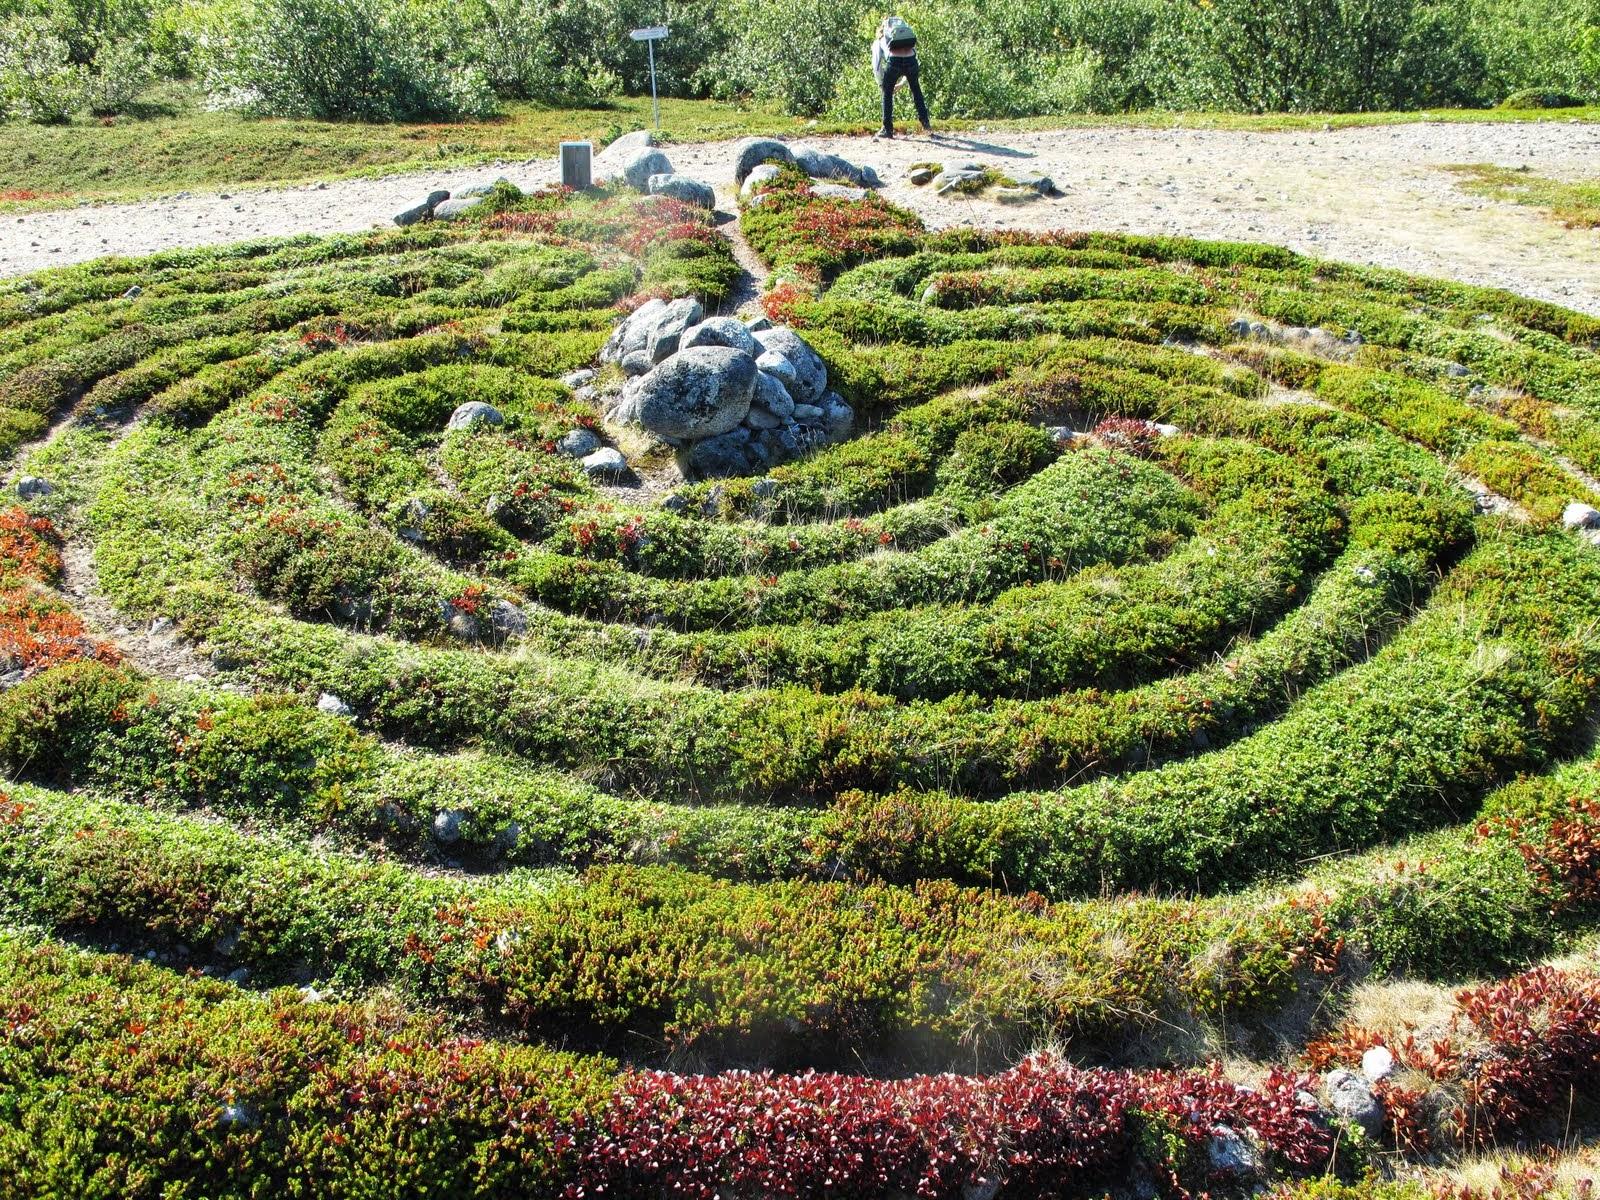 labirintos russos - artefatos inexplicaveis